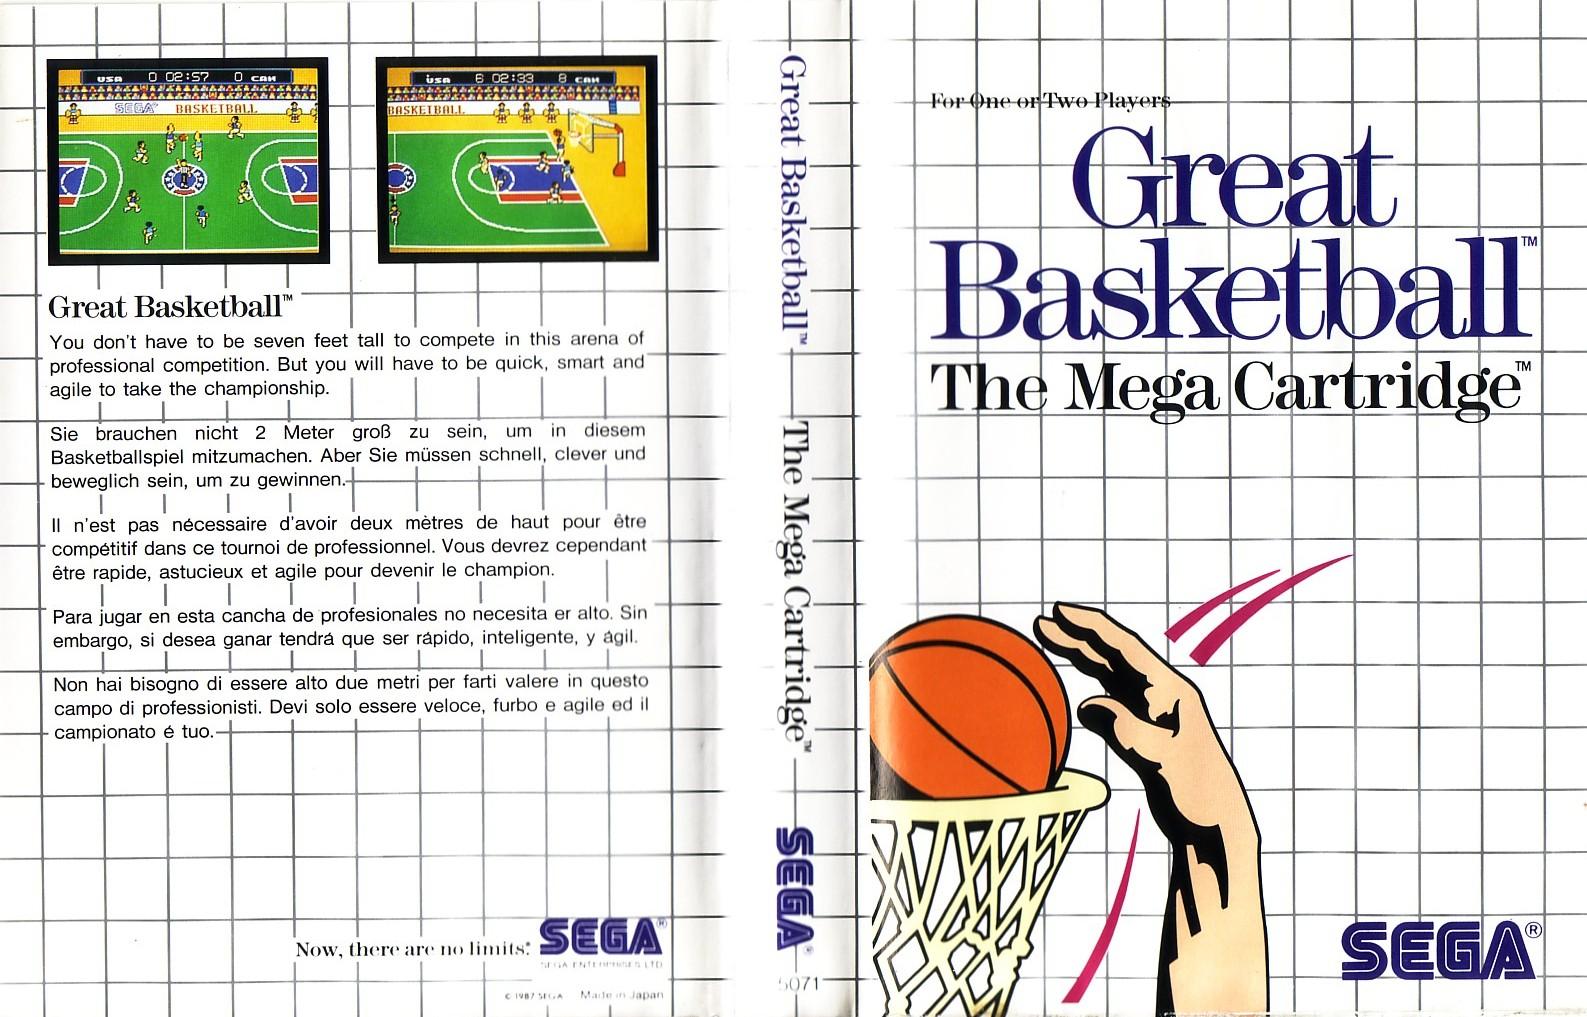 http://www.smspower.org/uploads/Scans/GreatBasketball-SMS-EU-NoLimits.jpg